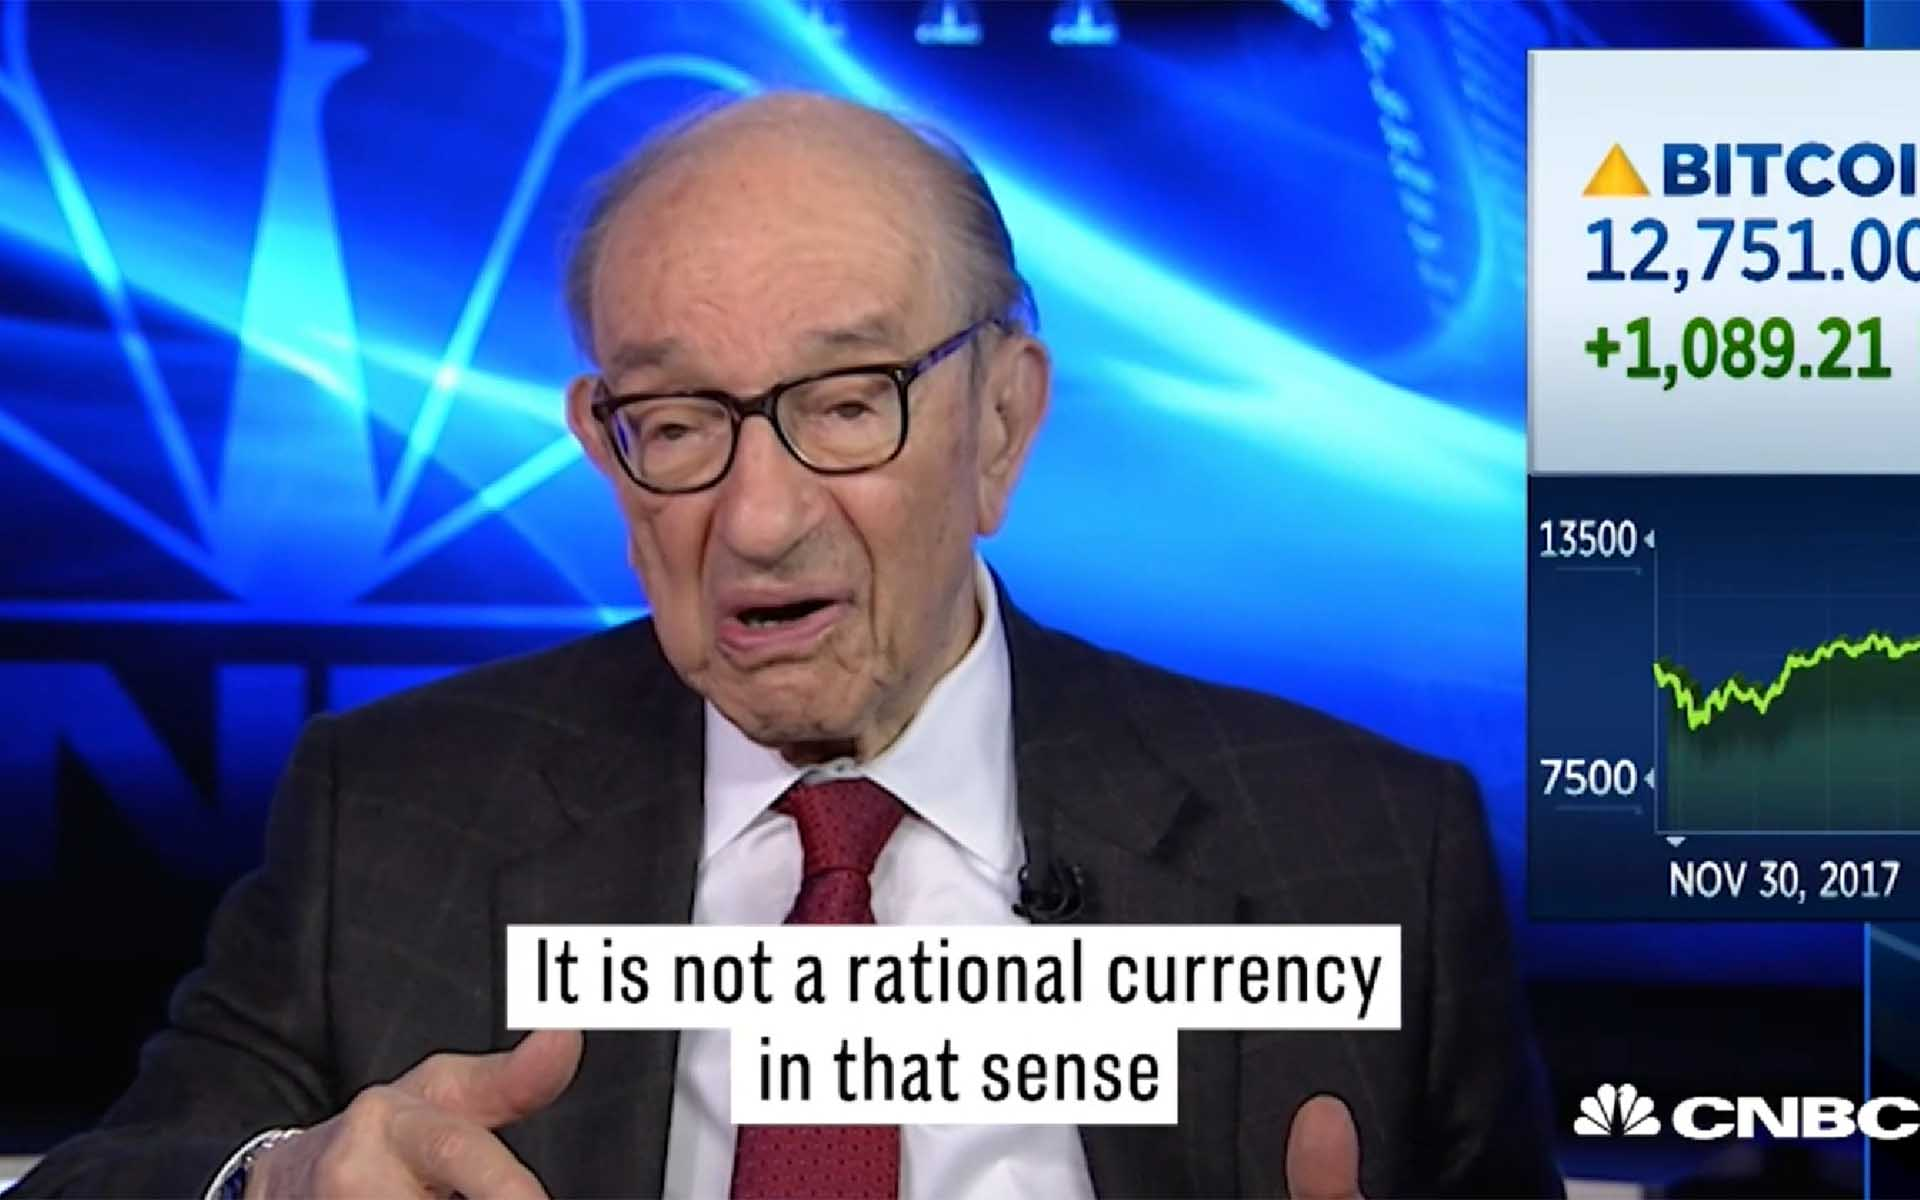 Former US Federal Reserve Chairman Alan Greenspan: Bitcoin Not Rational